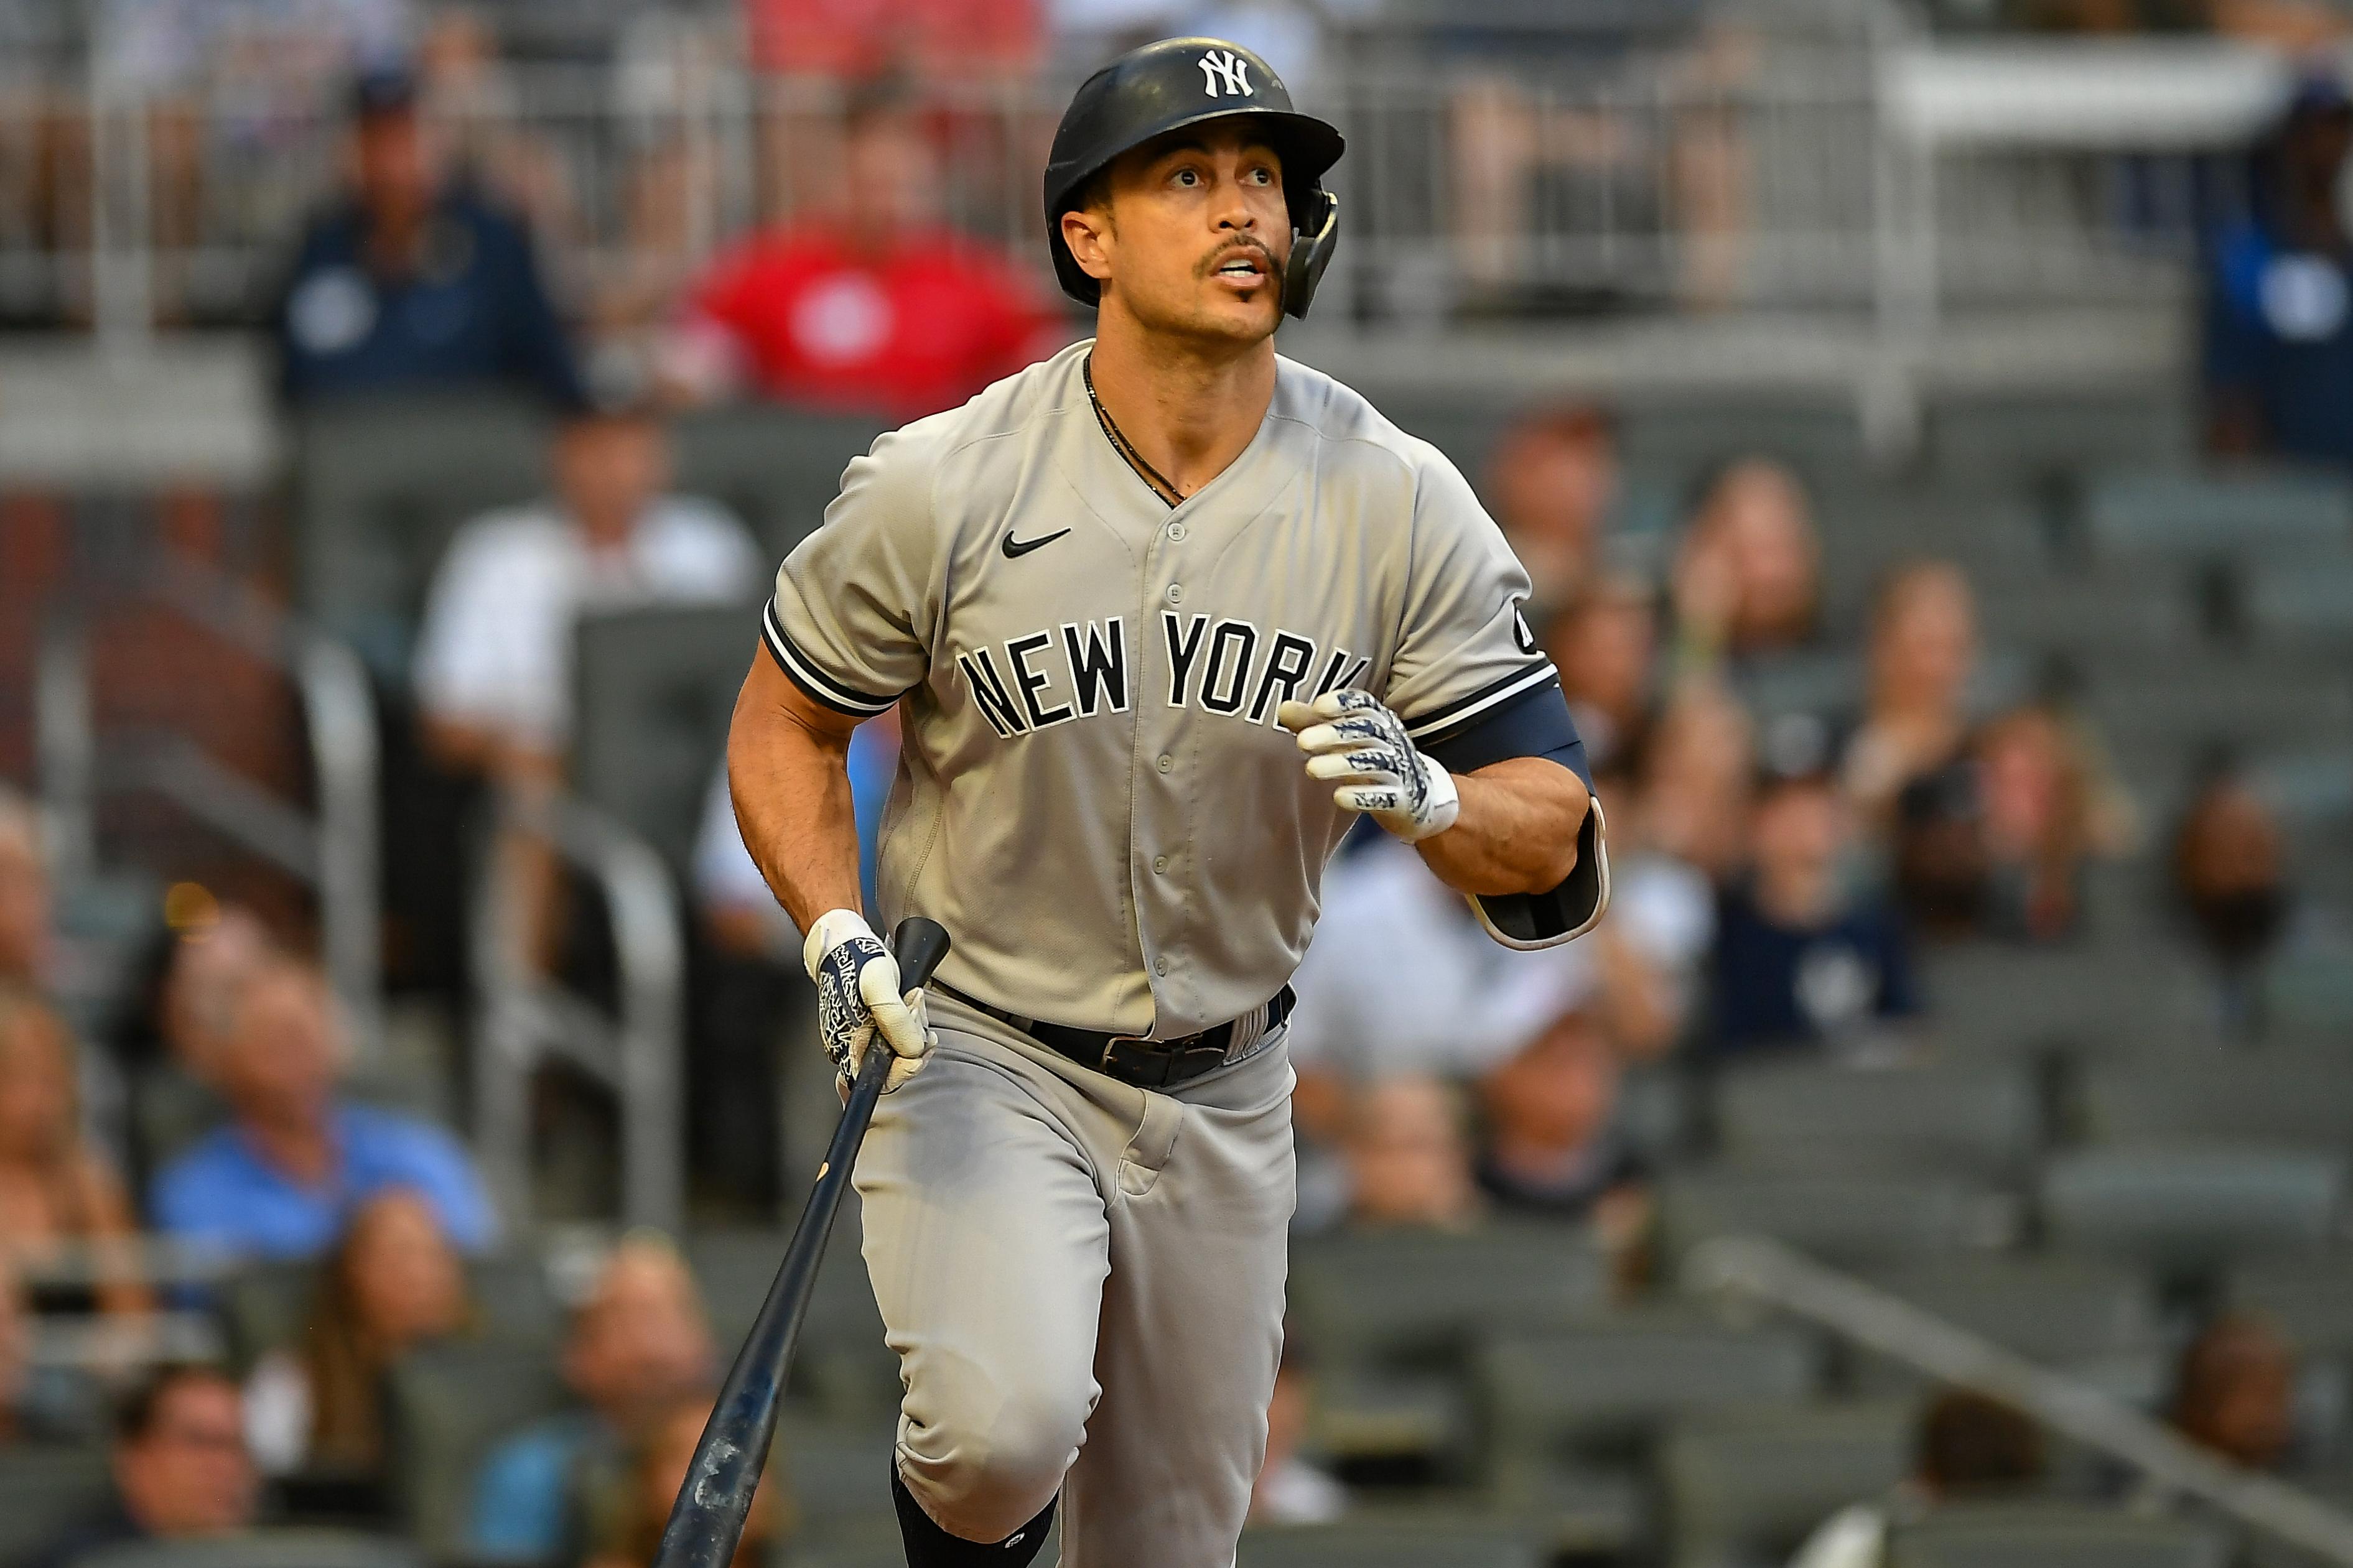 MLB: AUG 23 Yankees at Braves